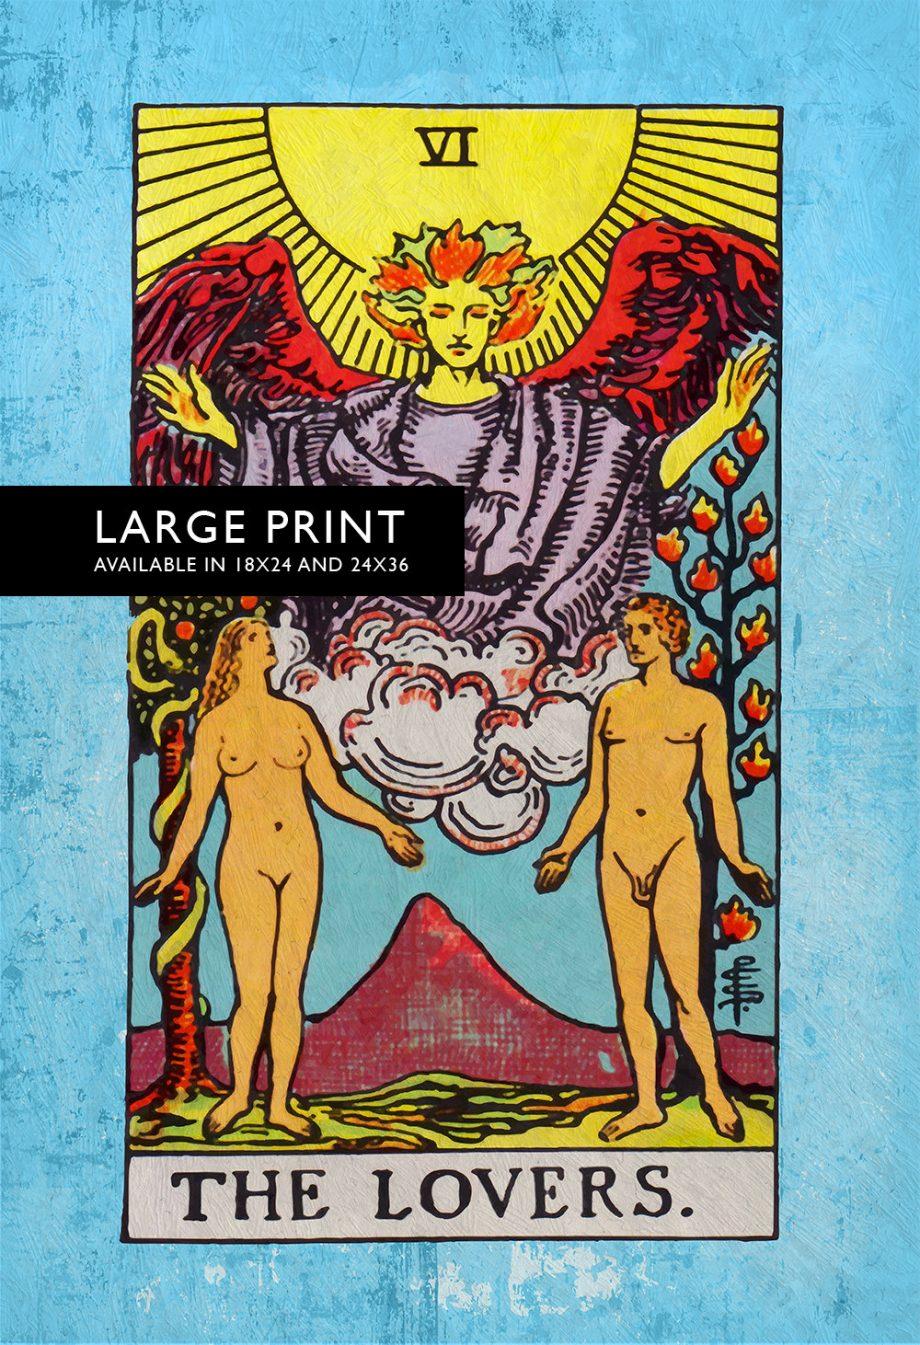 Tarot Print The Lovers Retro Illustration Art Rider Print Vintage Giclee on Cotton Canvas and Satin Photo Paper